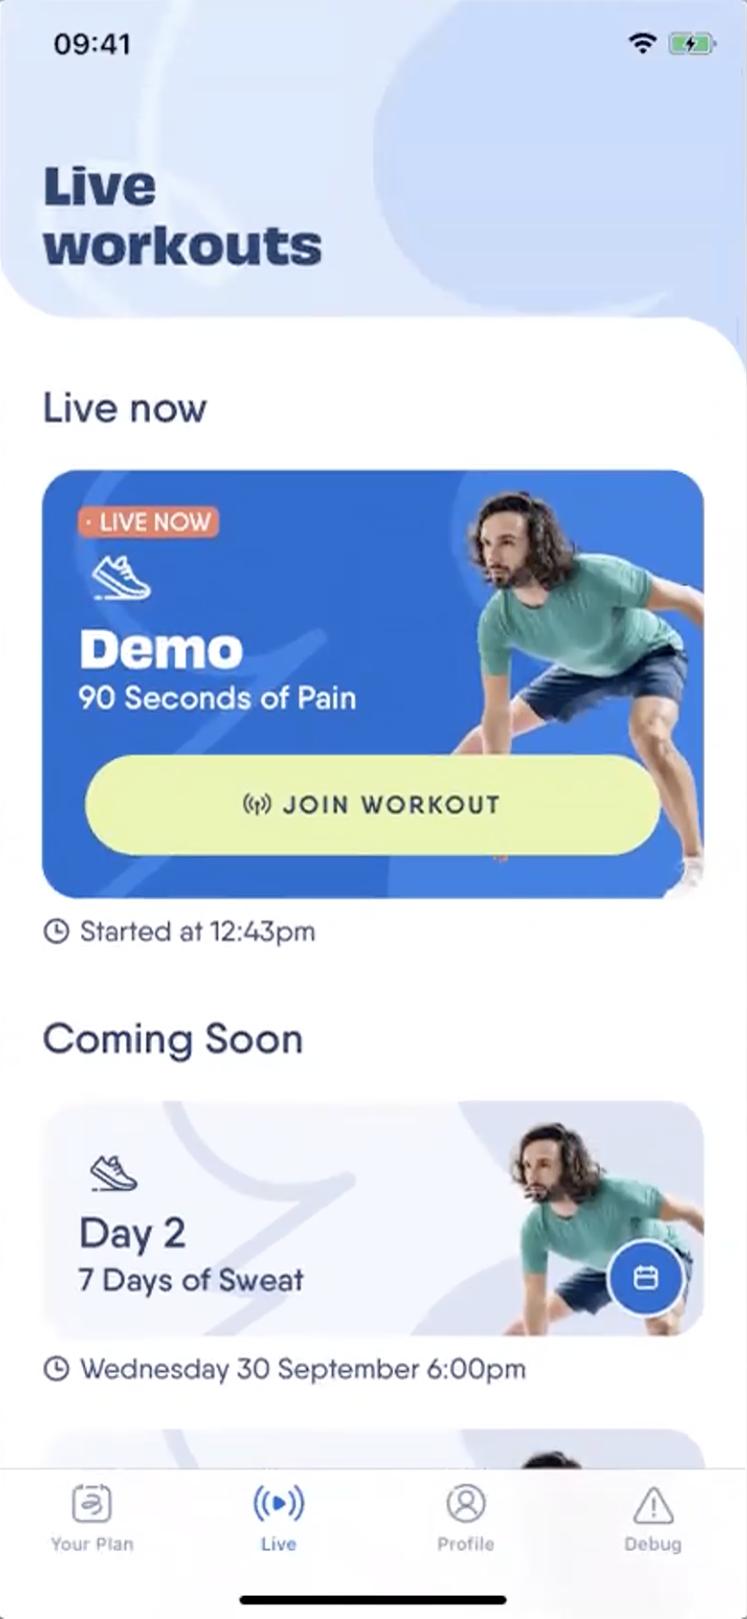 live workout demo